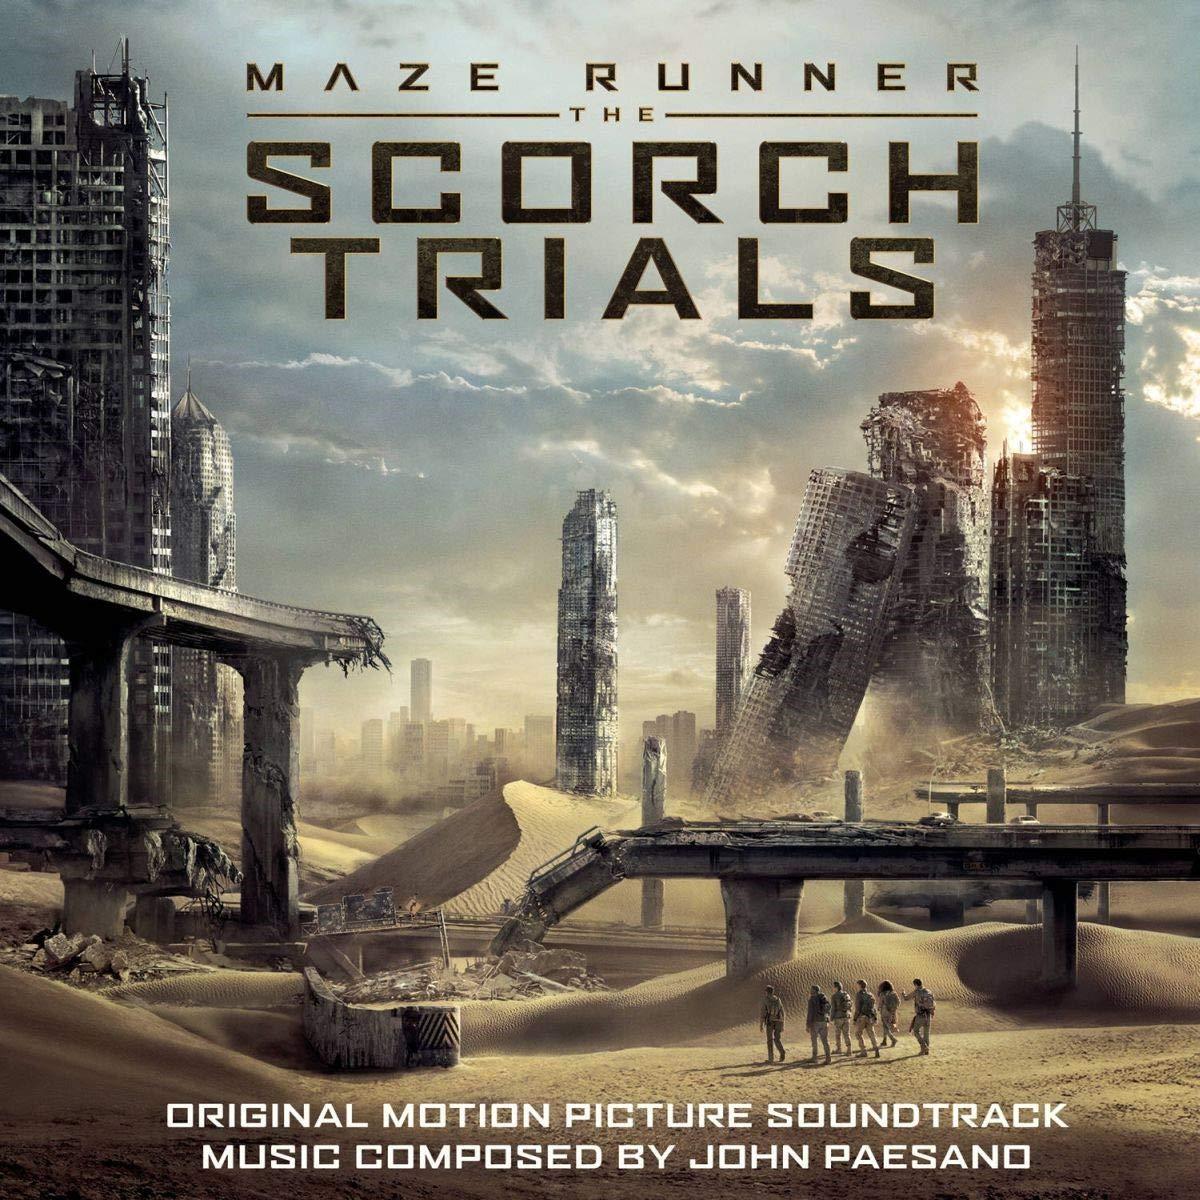 bande originale soundtrack ost score labyrinthe terre brulee maze runner scorch trials disney fox